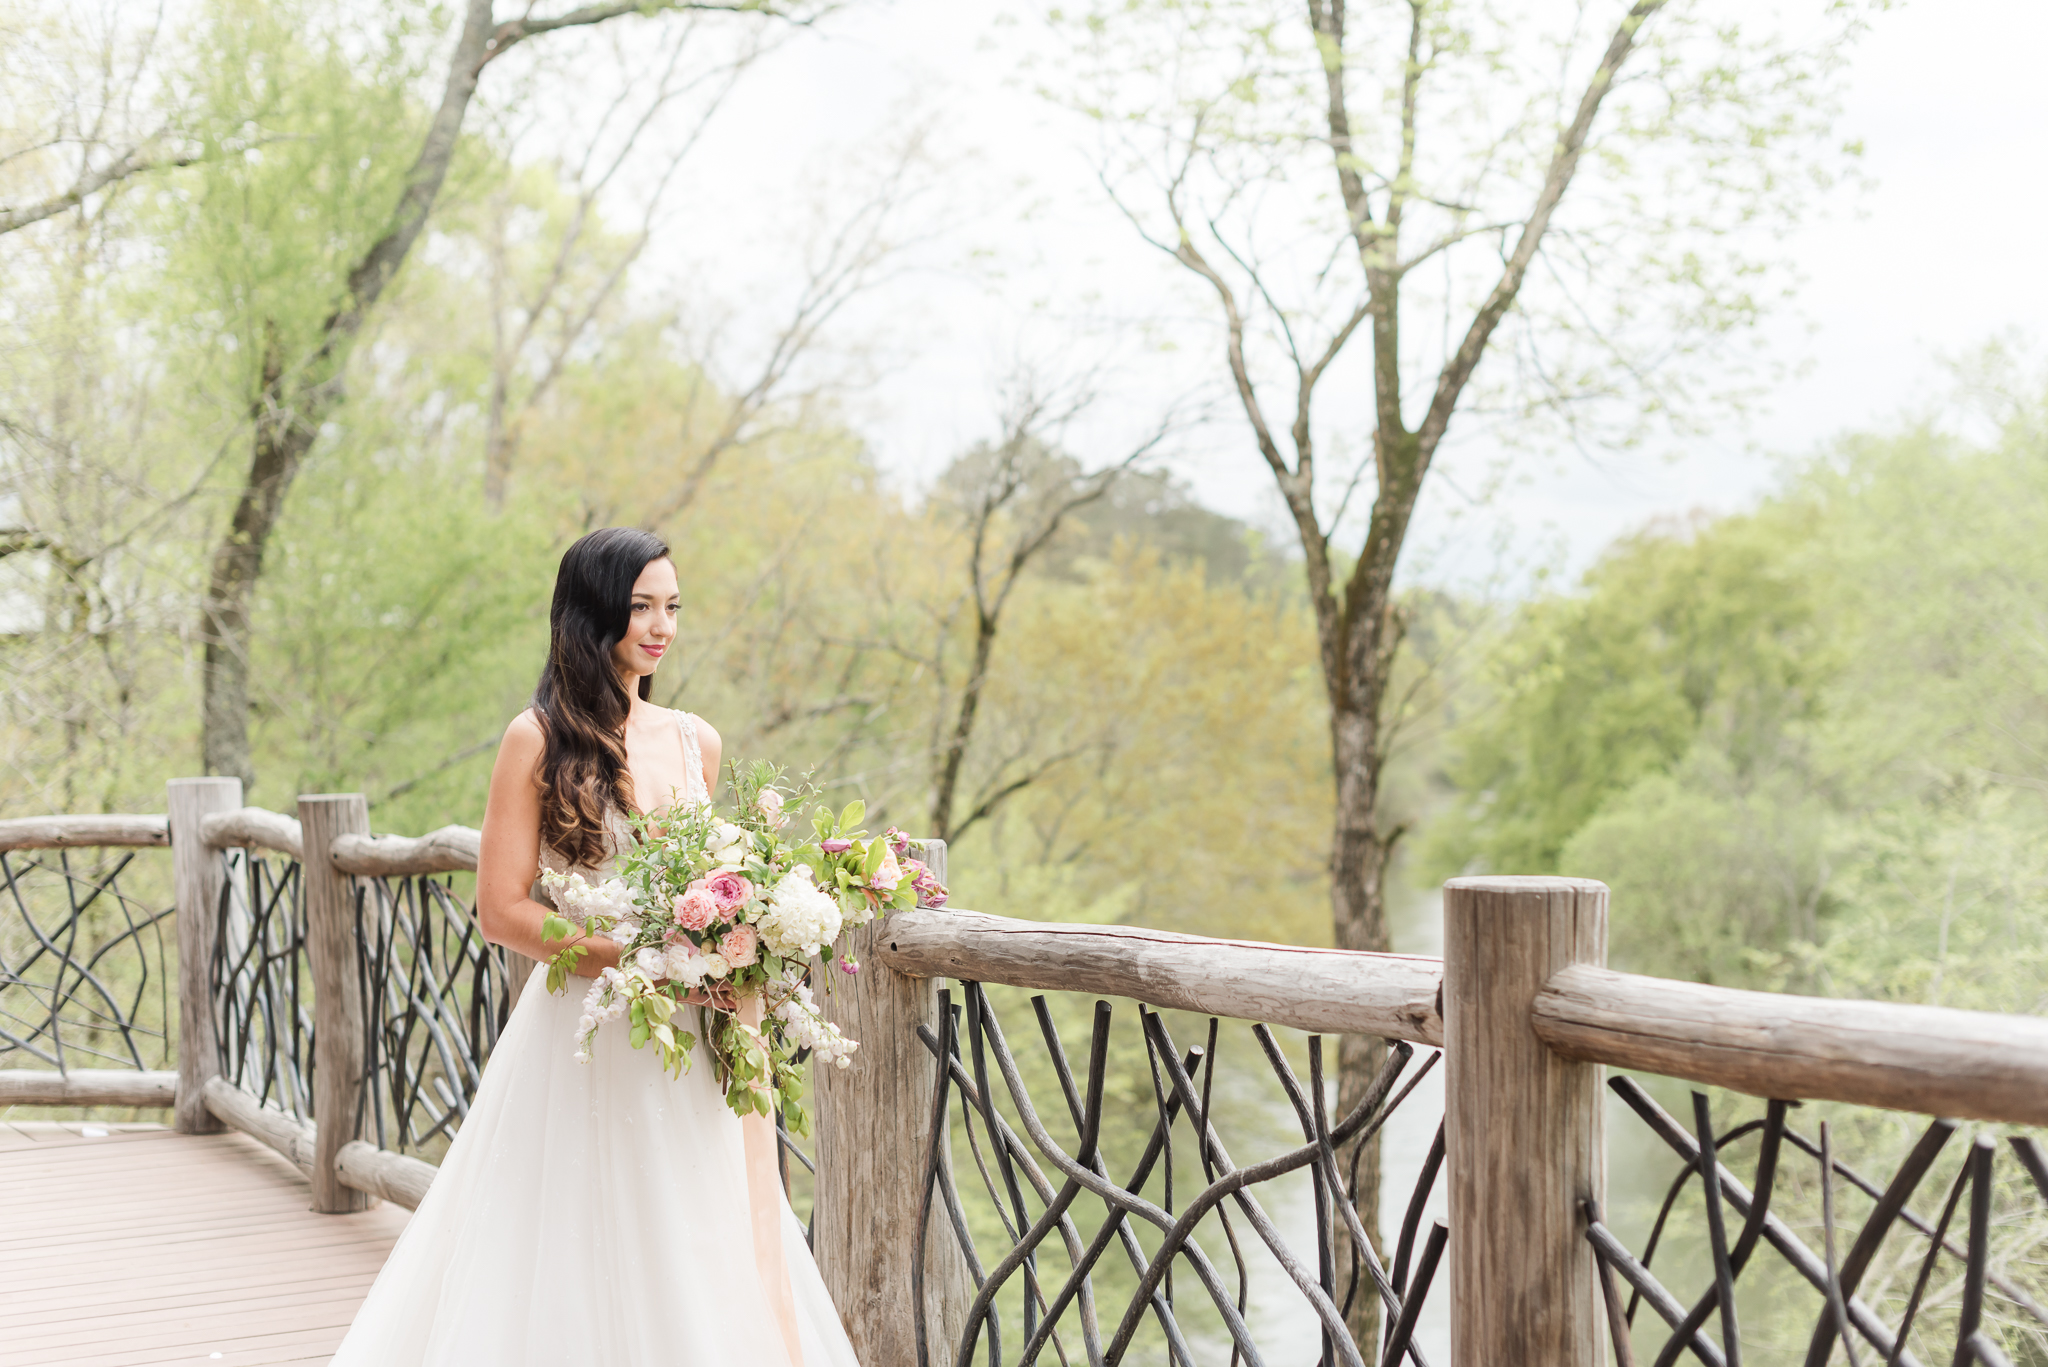 Wedding Day Bridal Portraits on the River-19.jpg